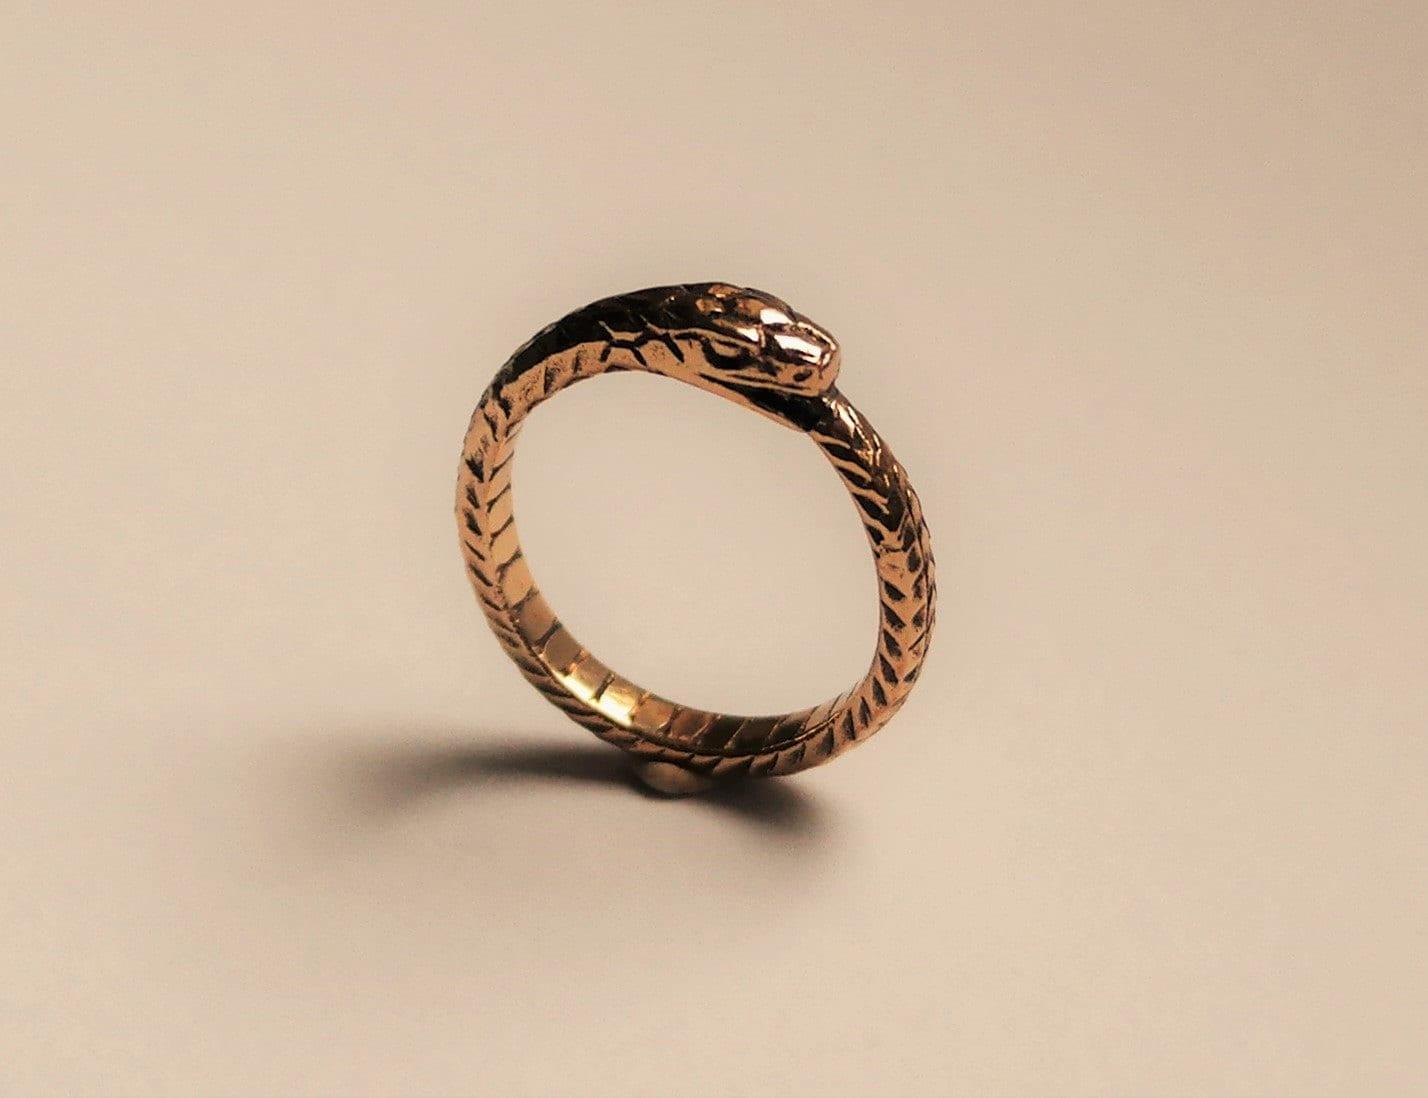 unisex wedding band unisex wedding bands Ouroboros bronze ring handmade brass ouroboros ring